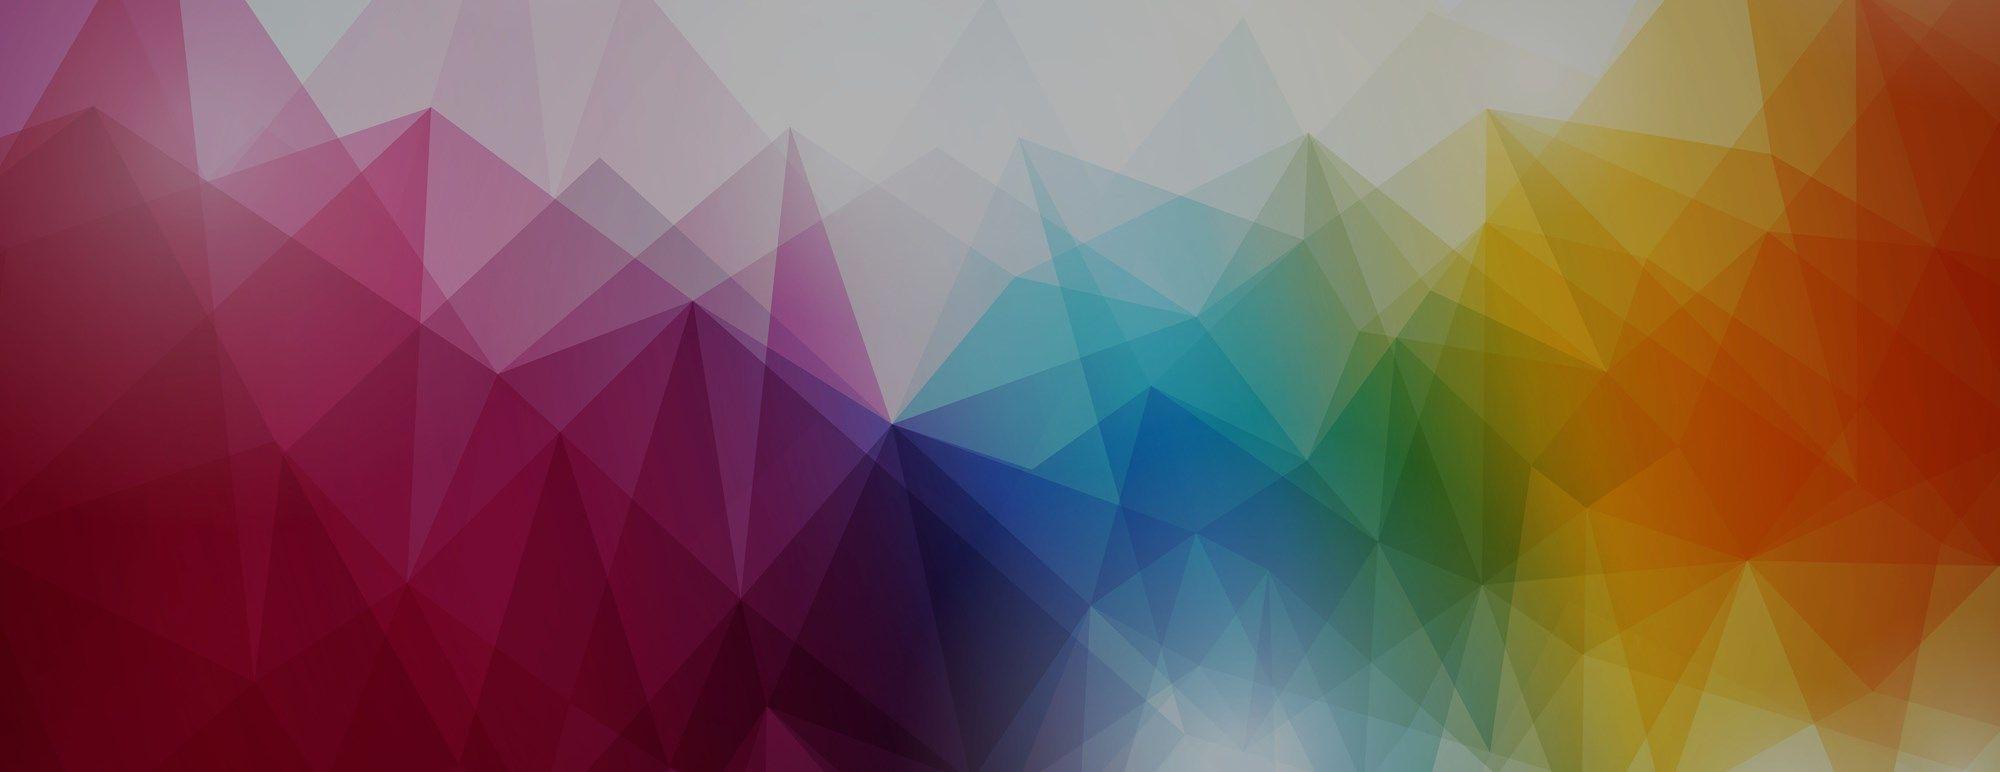 Interactive Design & Development, Malta Europe | CasaSoft